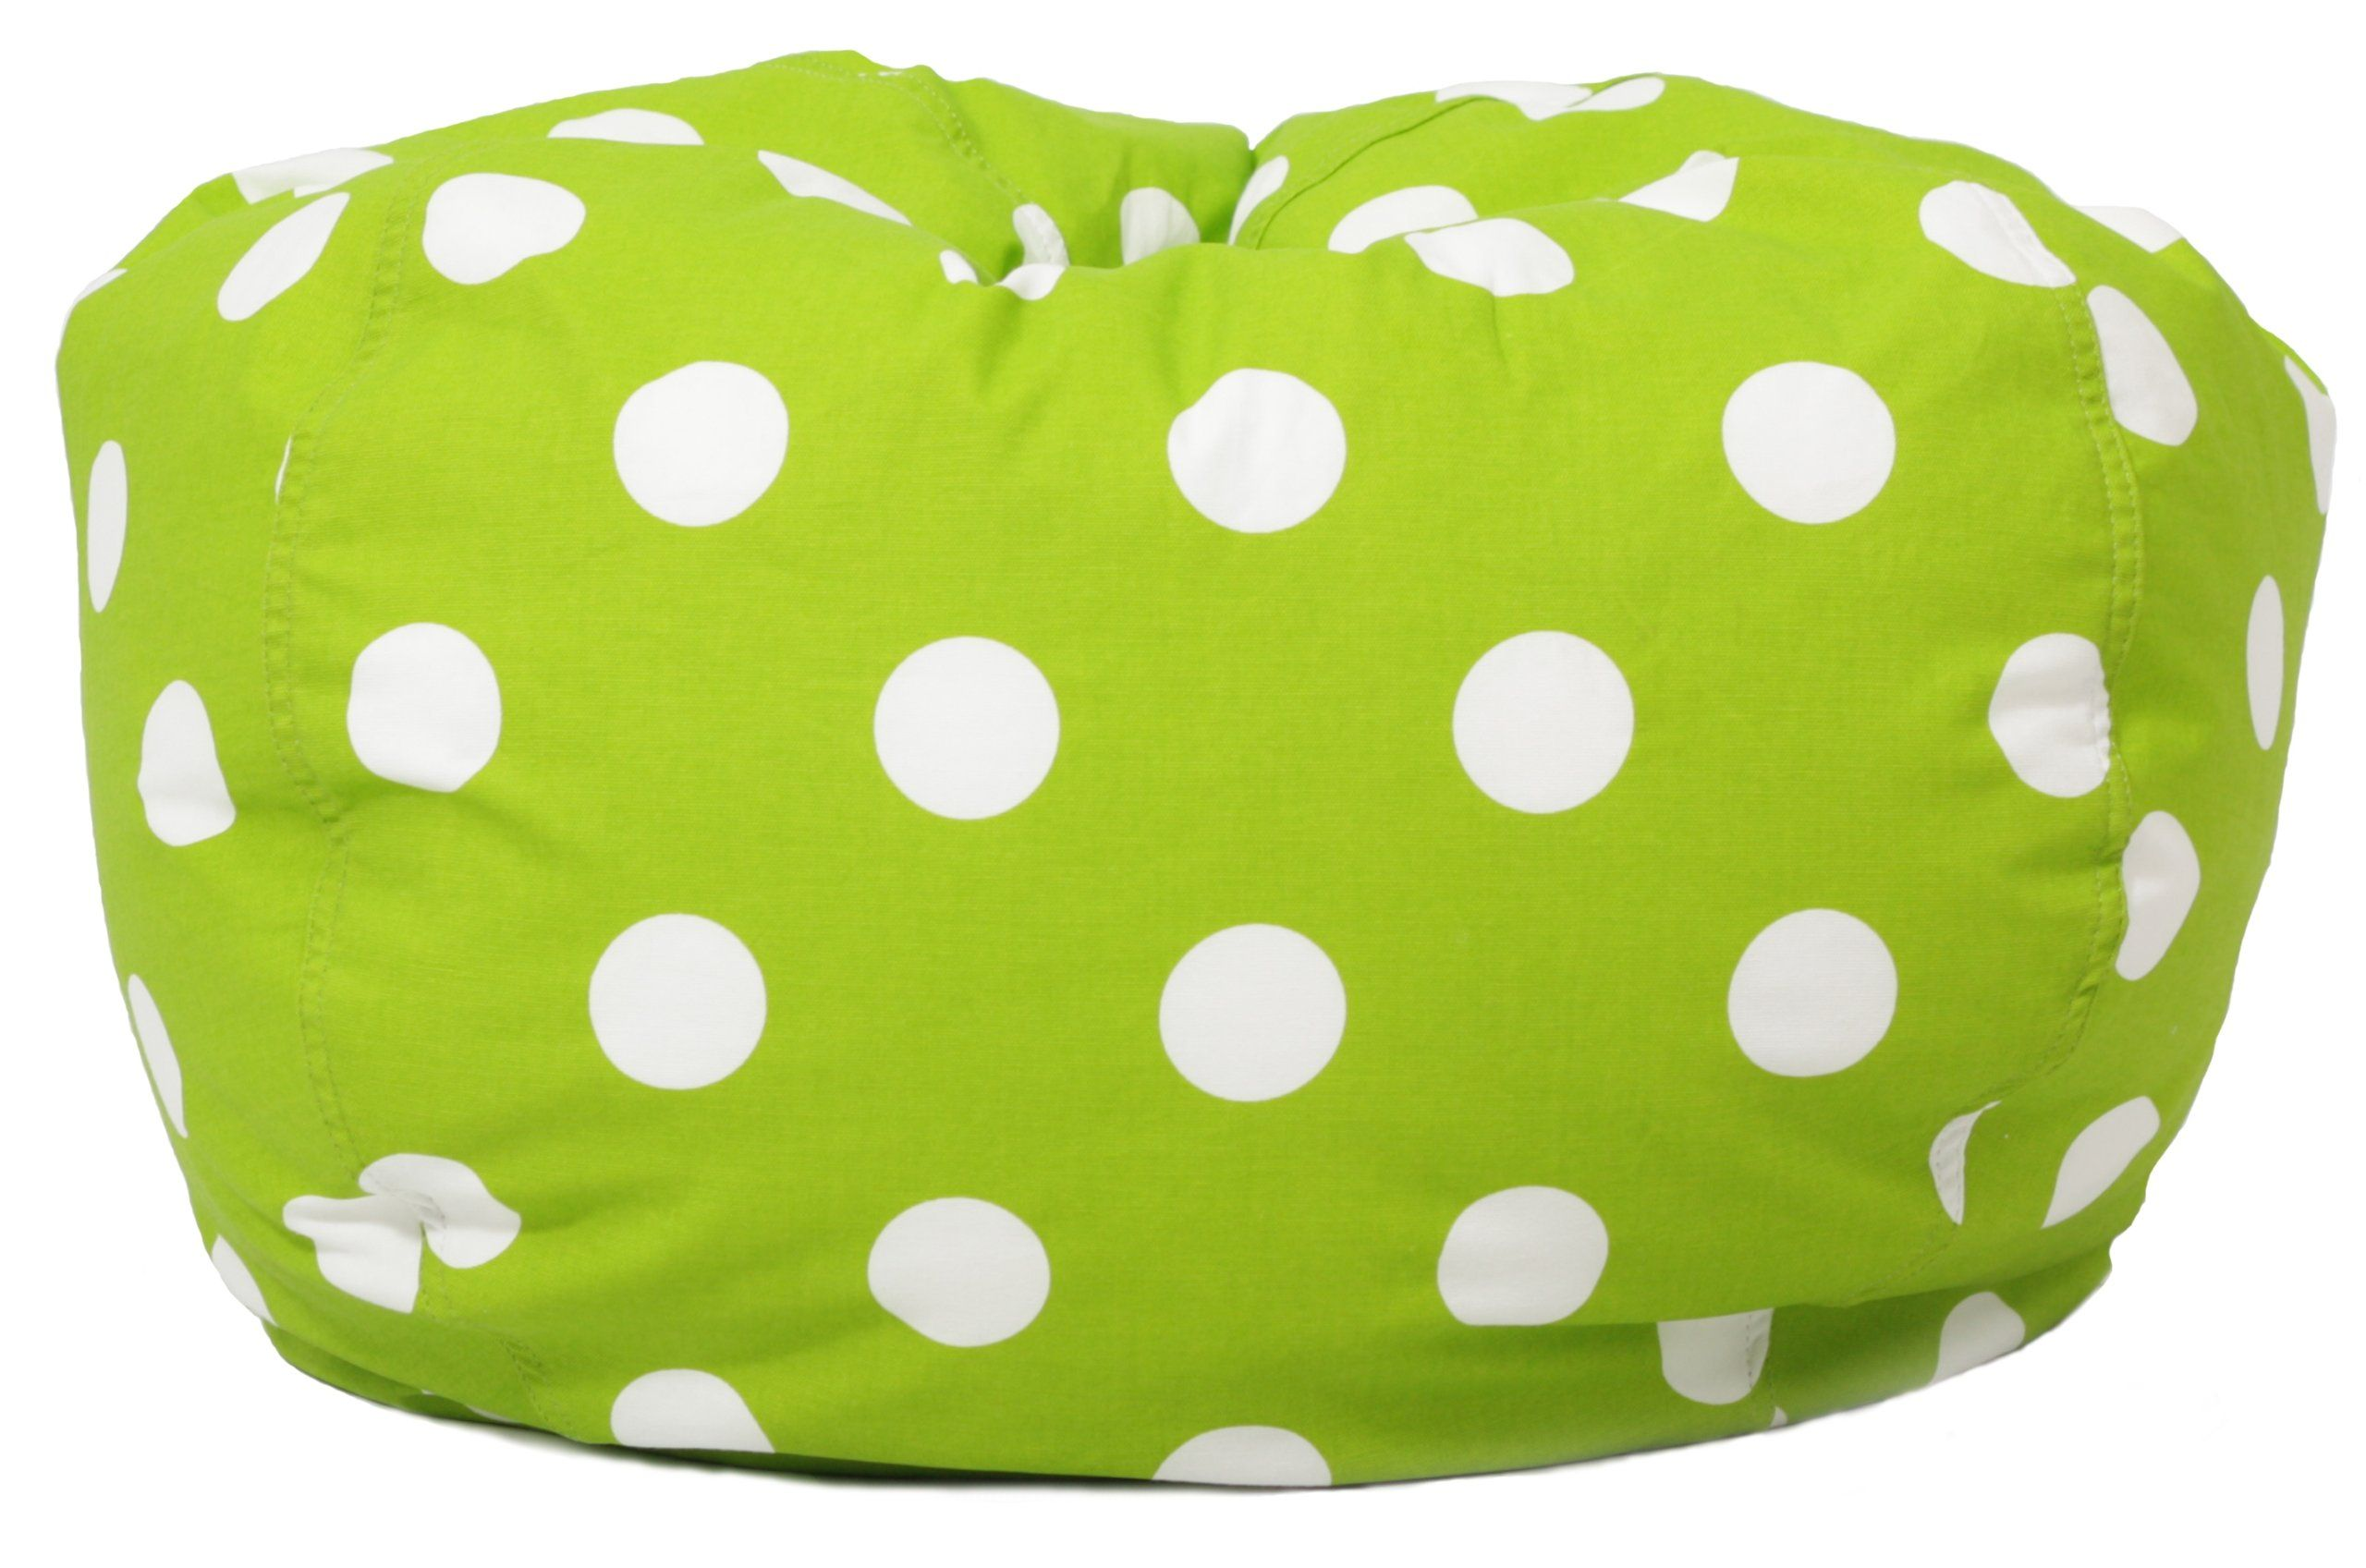 $29.99 Amazon.com   Comfort Research Classic Bean Bag Chair, Candy Pink  Polka Dot